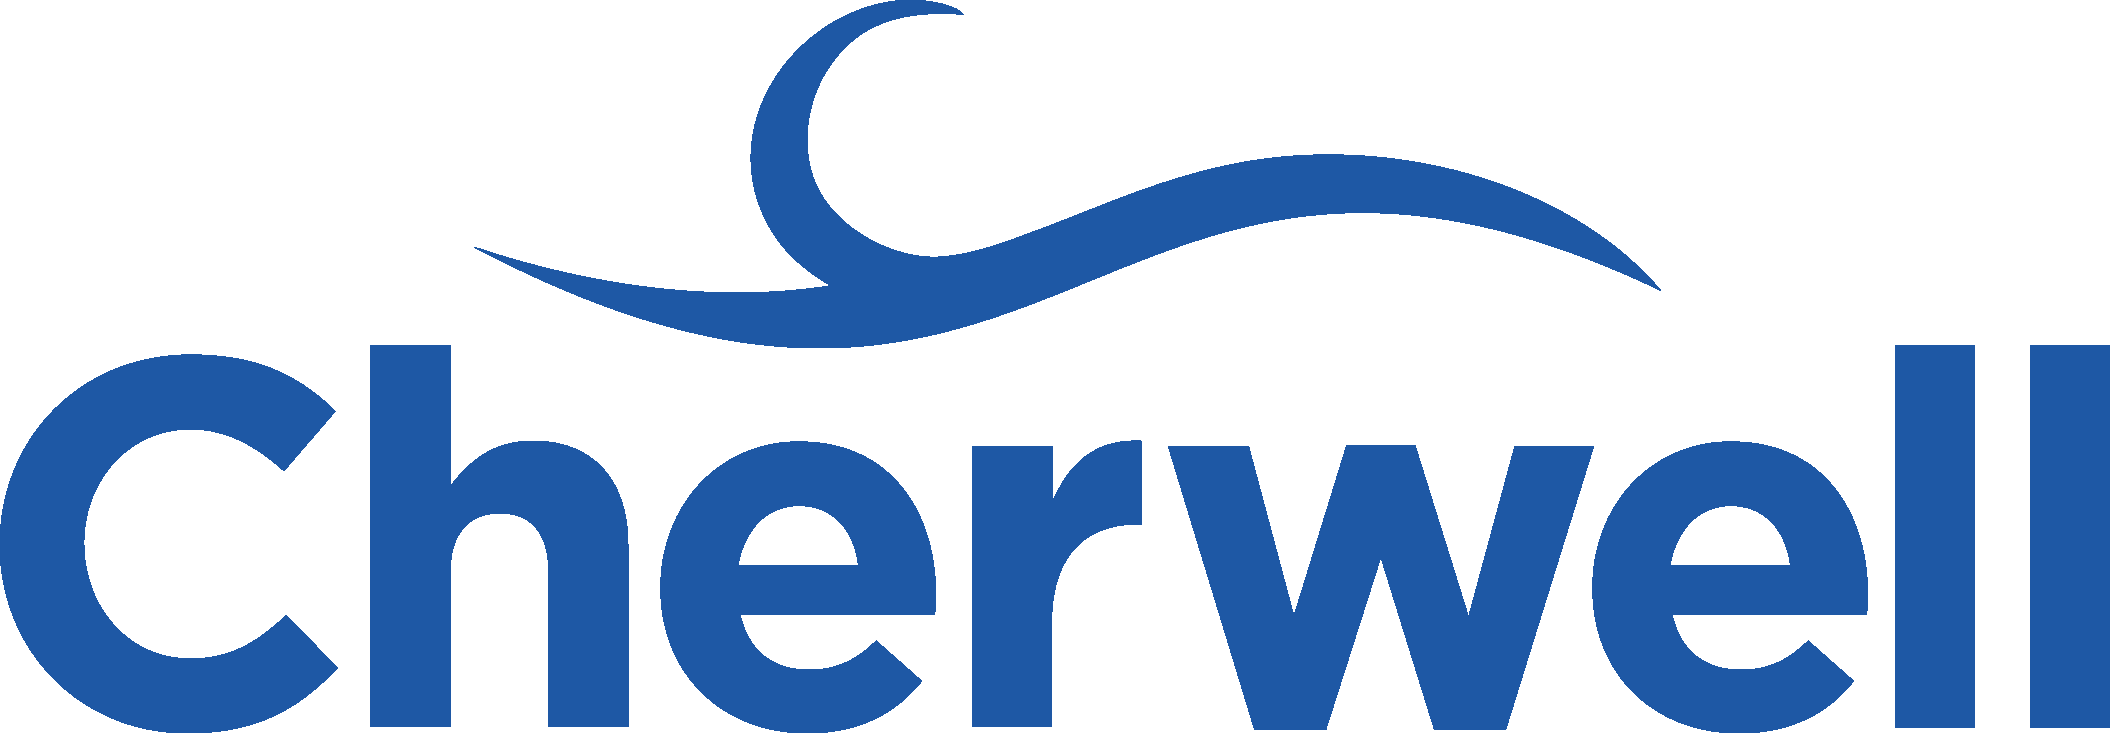 Cherwell Logo png